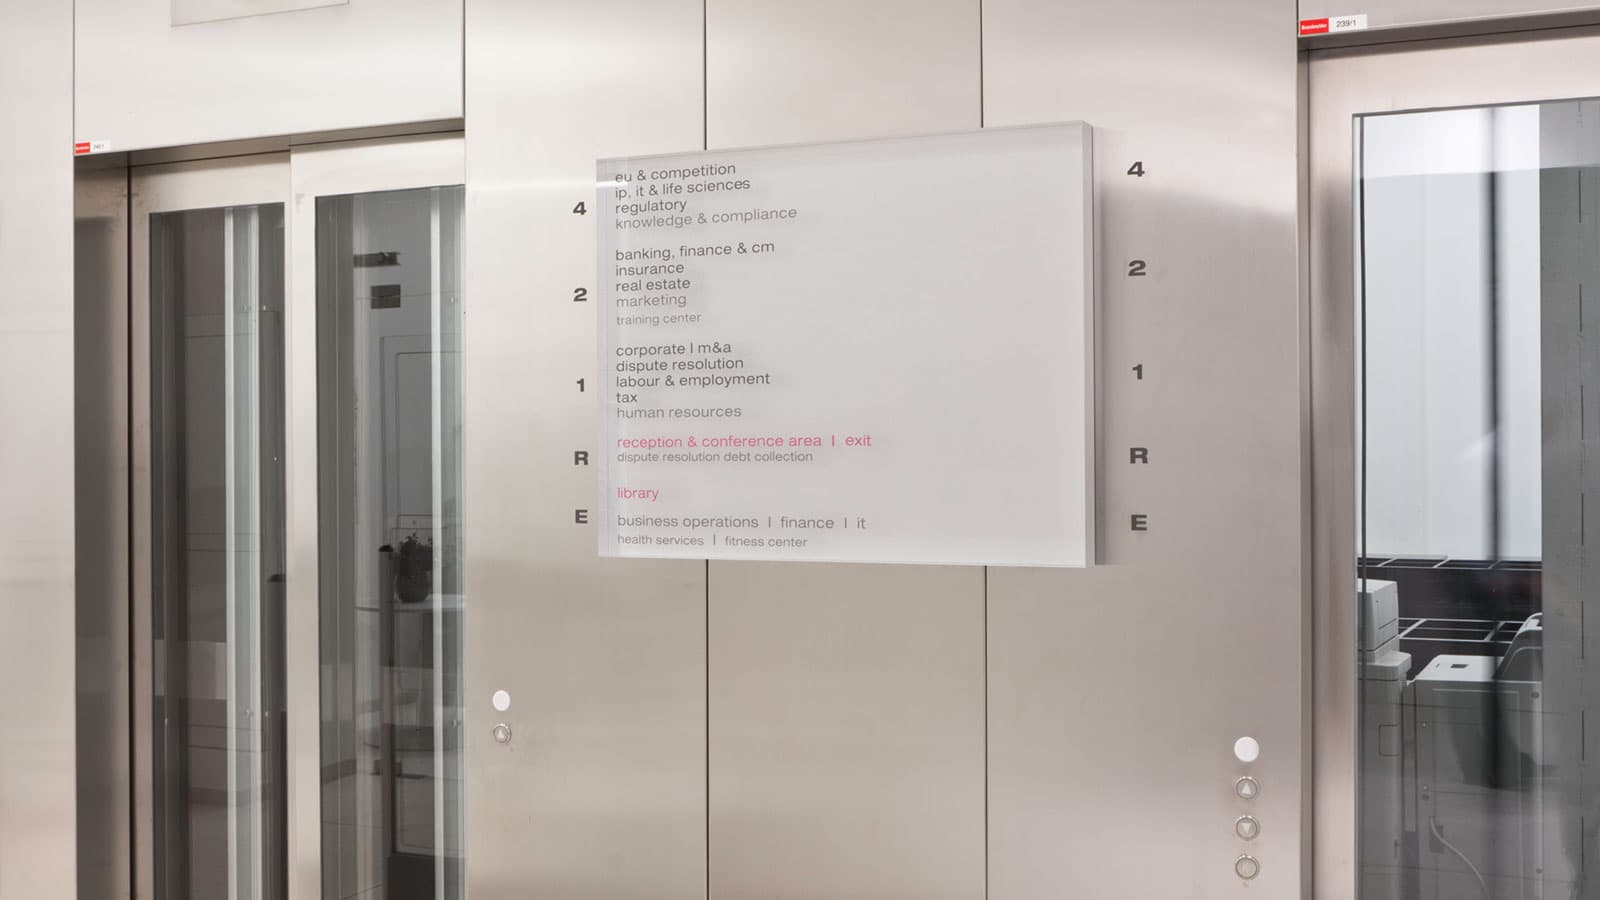 Folienbeklebung, Beschriftung Leitsystem, Sichtschutz, Milchglasfolien